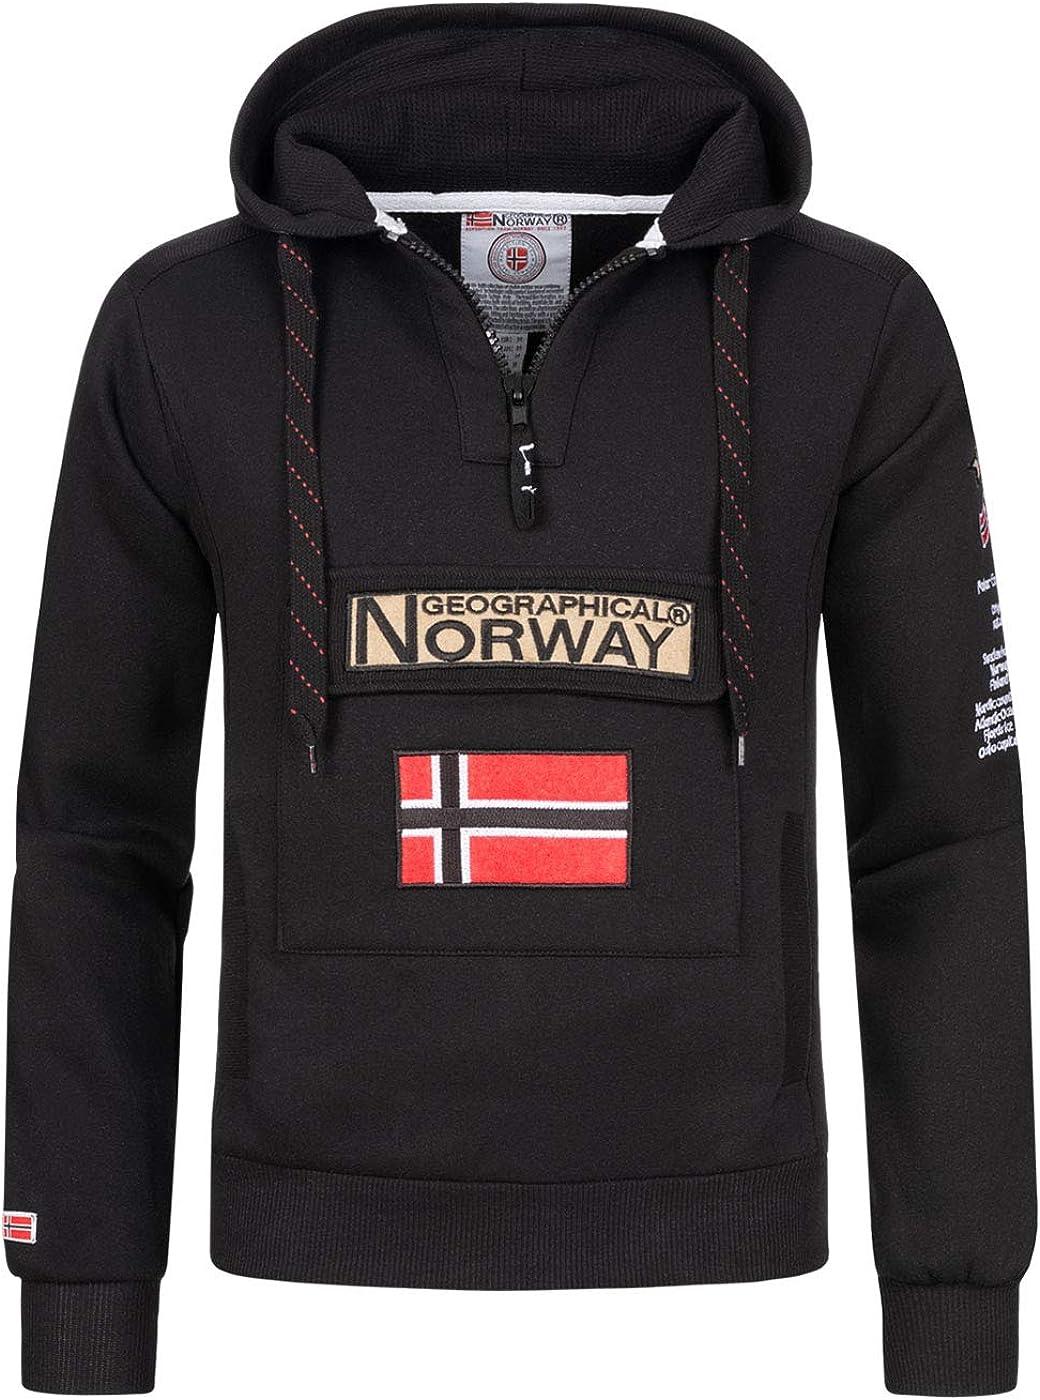 Geographical Norway Sudadera DE Hombre GYMCLASS A Negro L